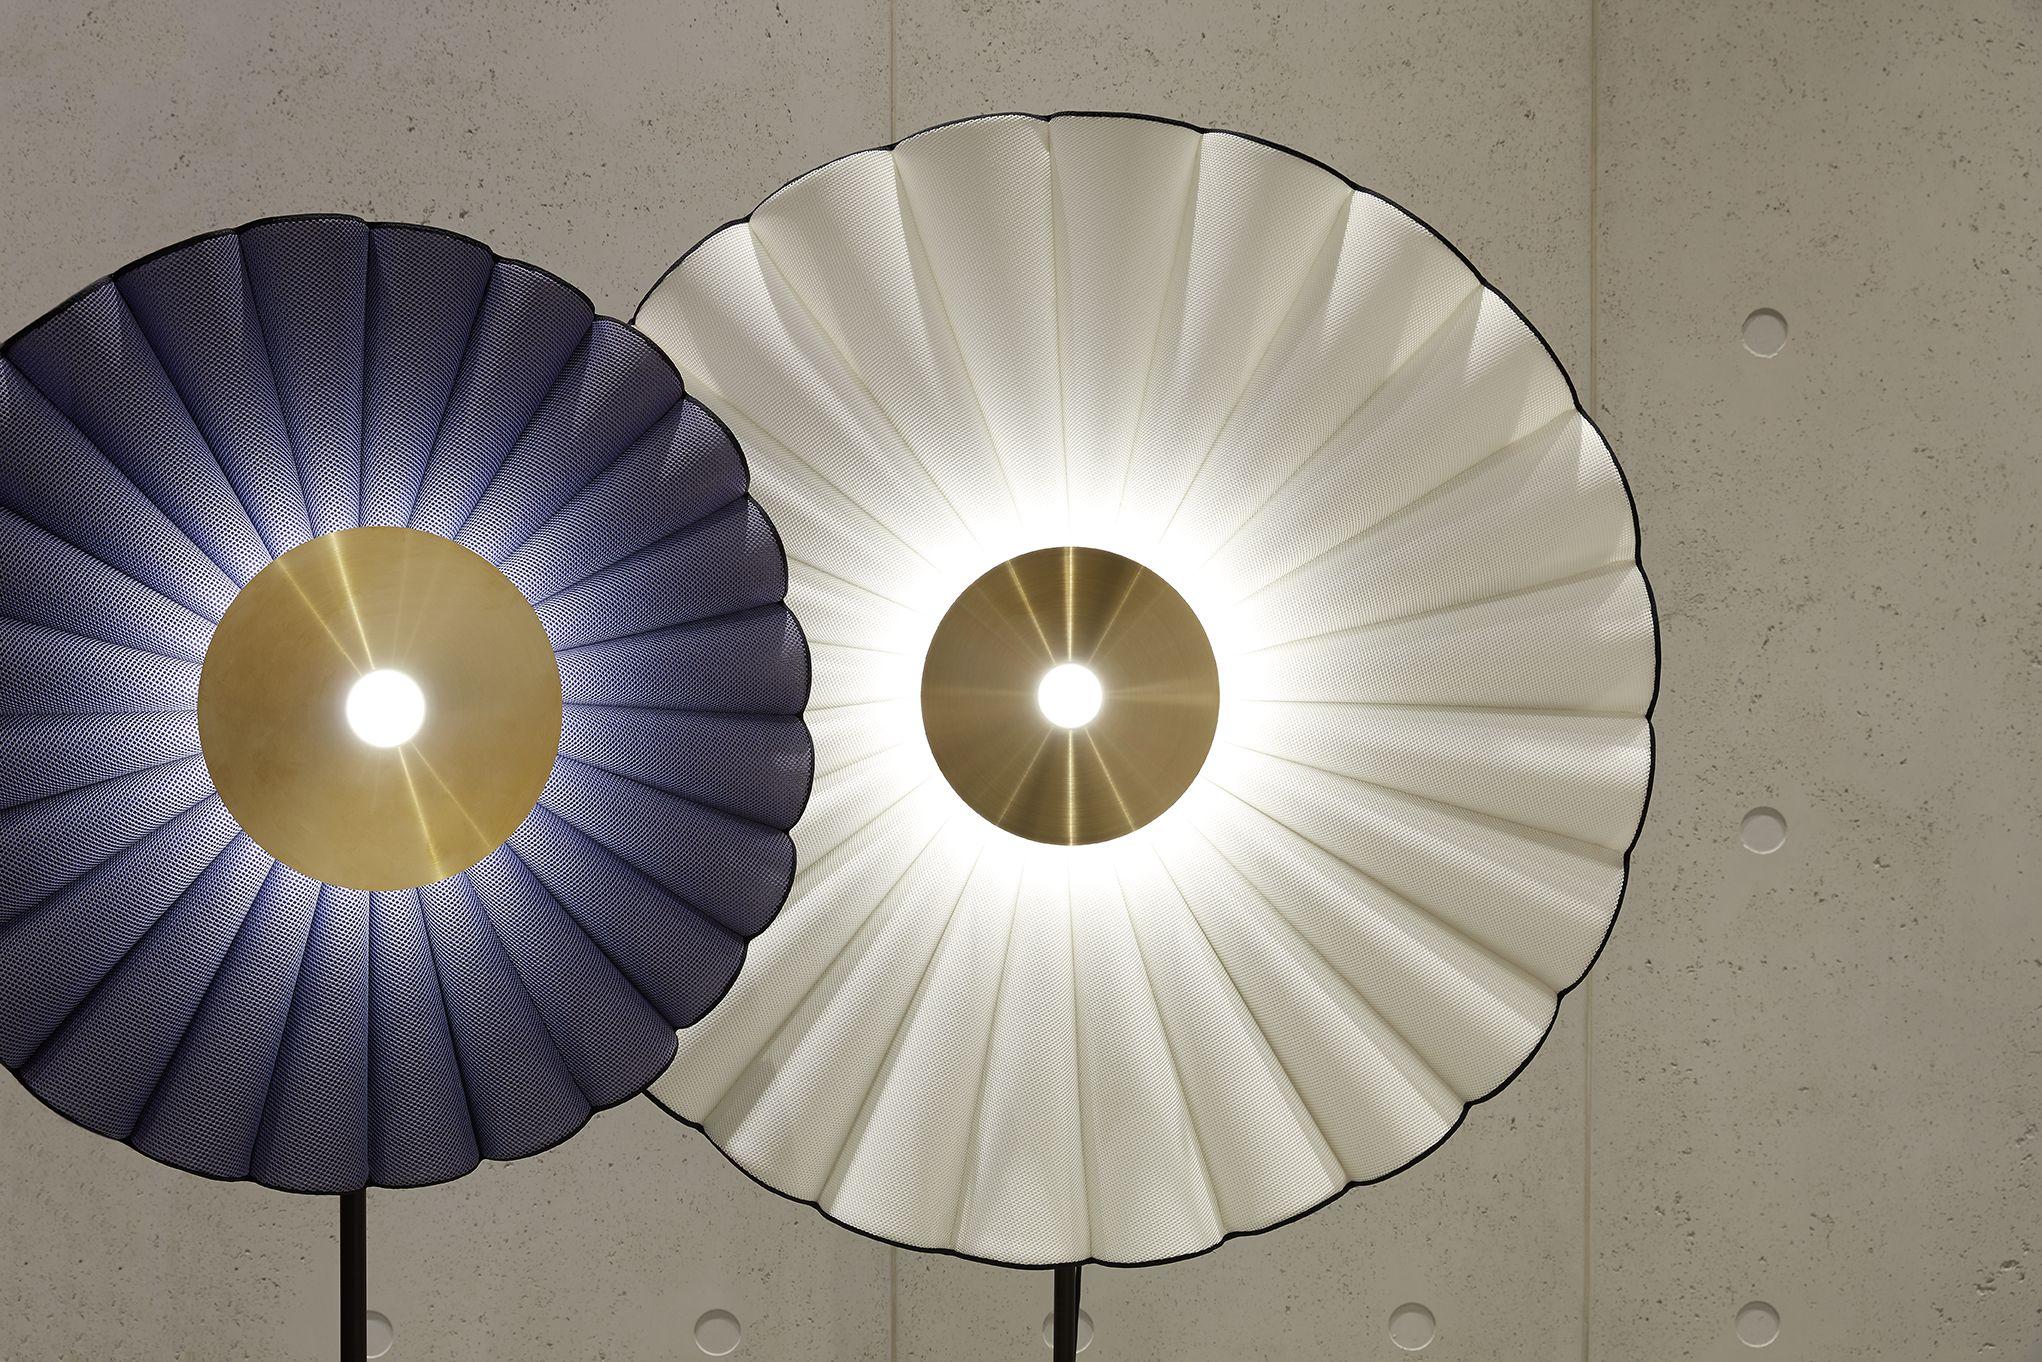 roche bobois reine floor lamp designed by chape mache. Black Bedroom Furniture Sets. Home Design Ideas